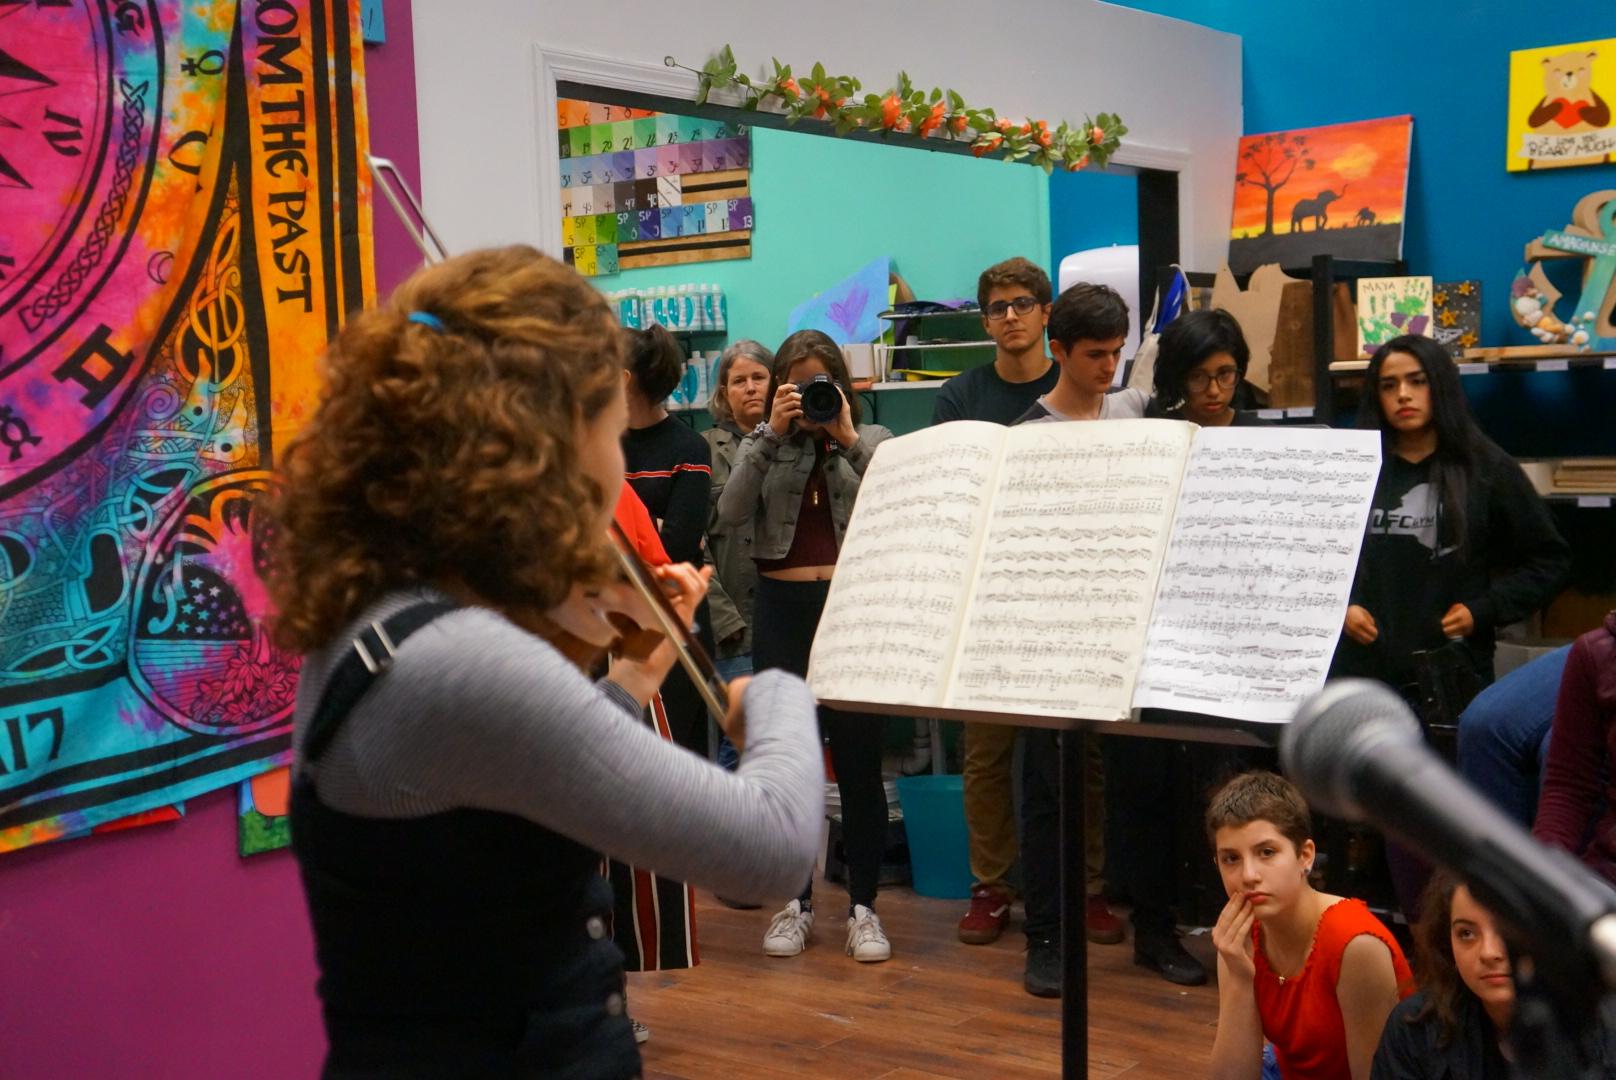 Shai Wexler performing on her violin